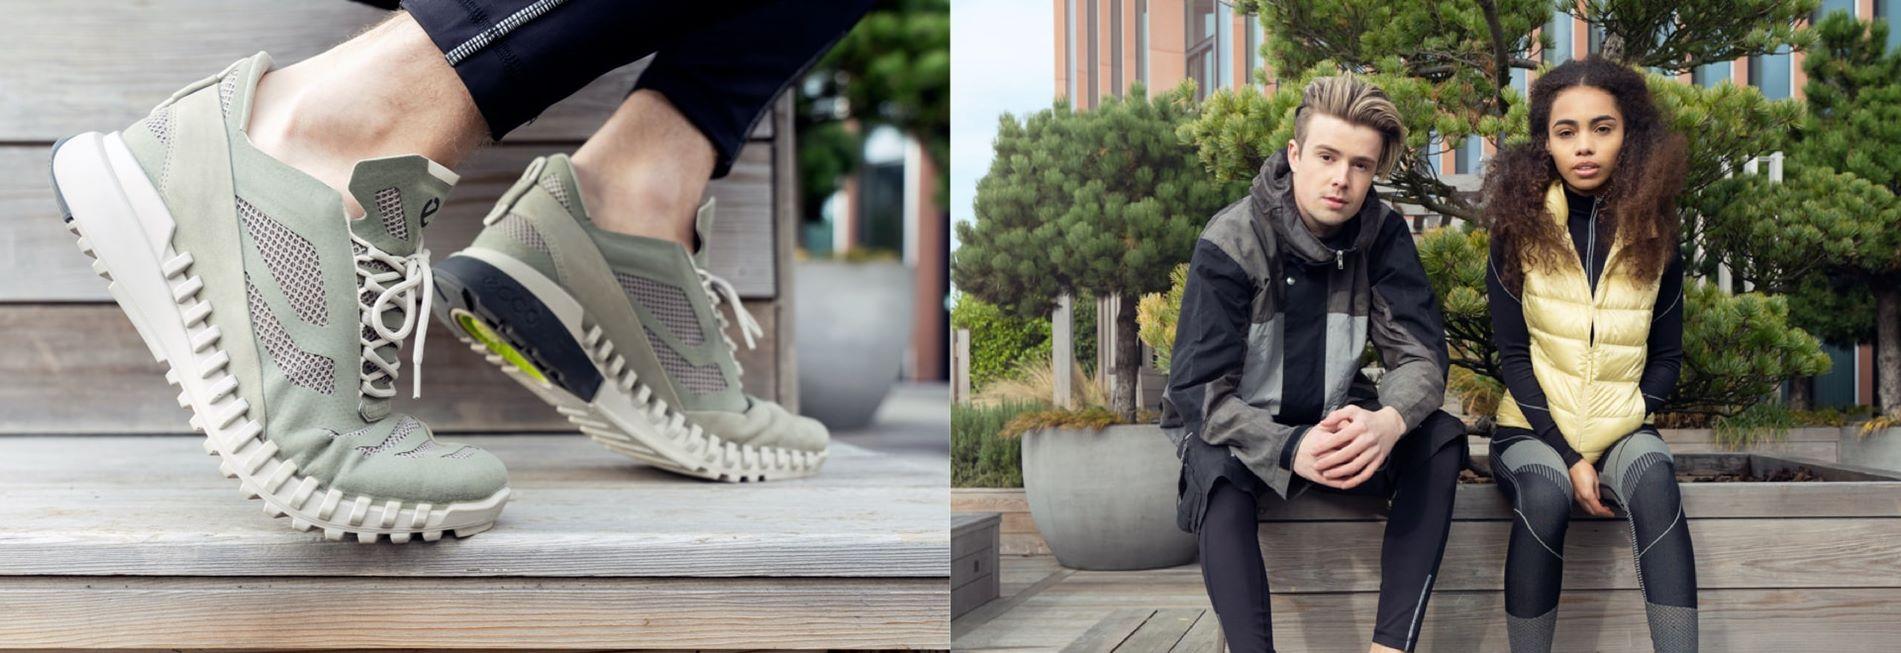 Ecco Is A Global Leader In Innovative Comfort Footwear For Men Ladies And Kids Ecco Com